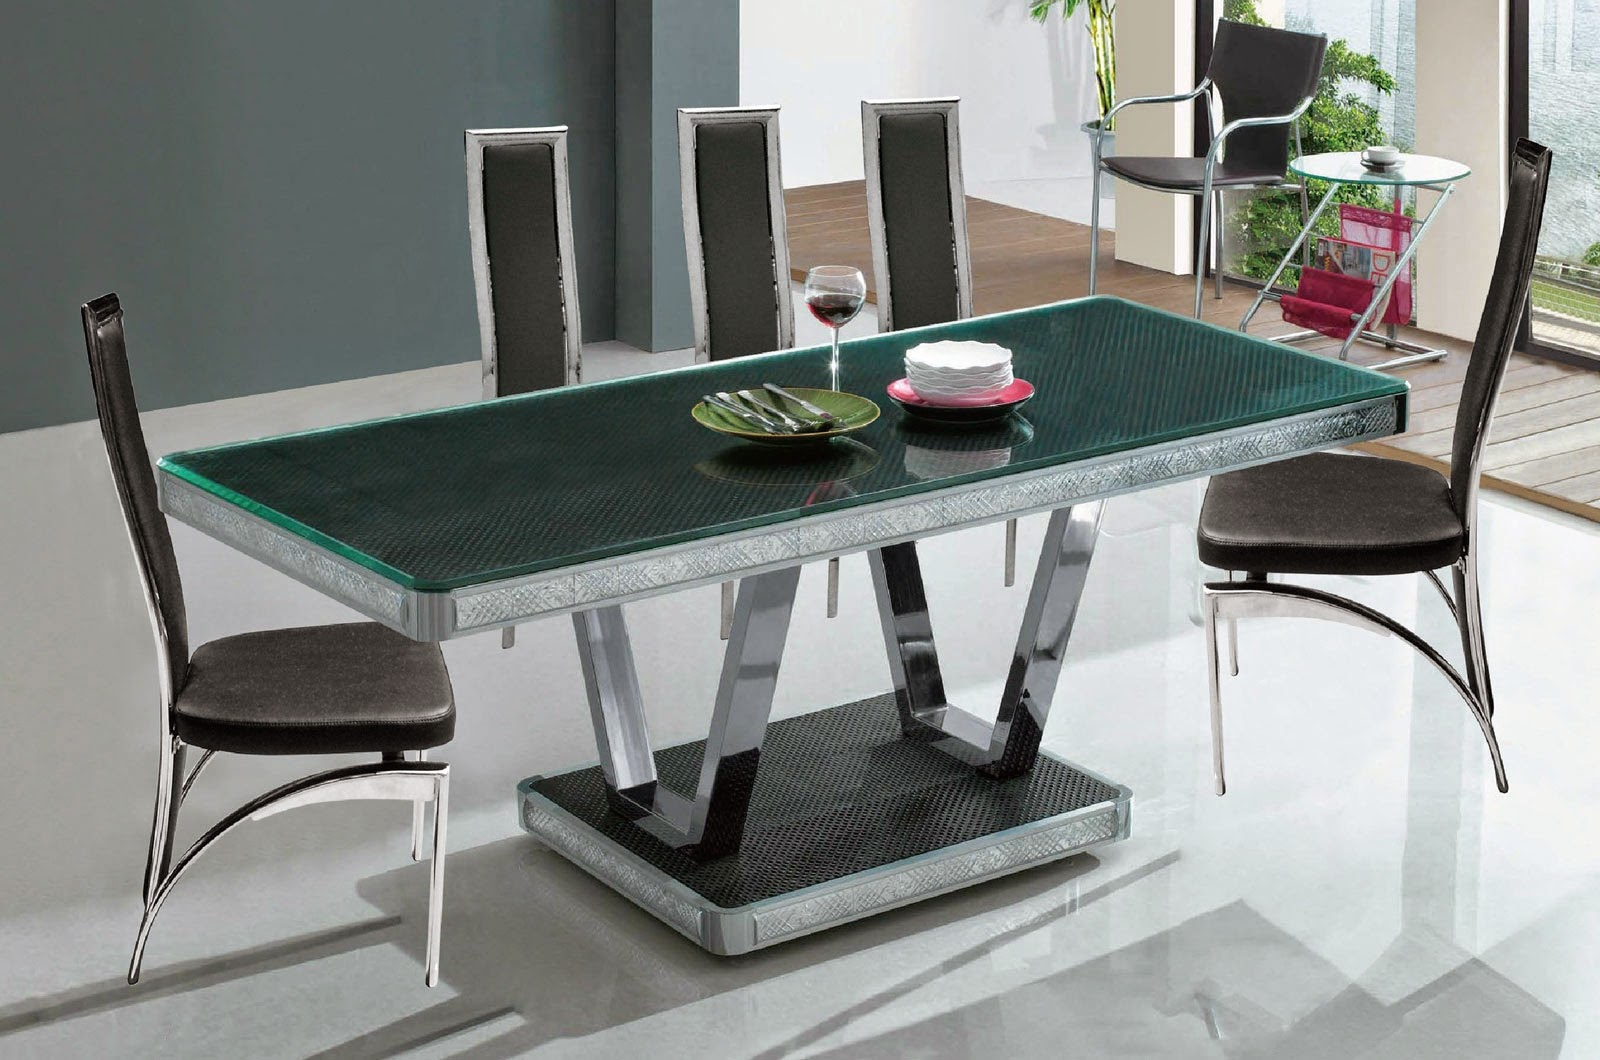 Table-Eat-Minimalist-Modern-Style